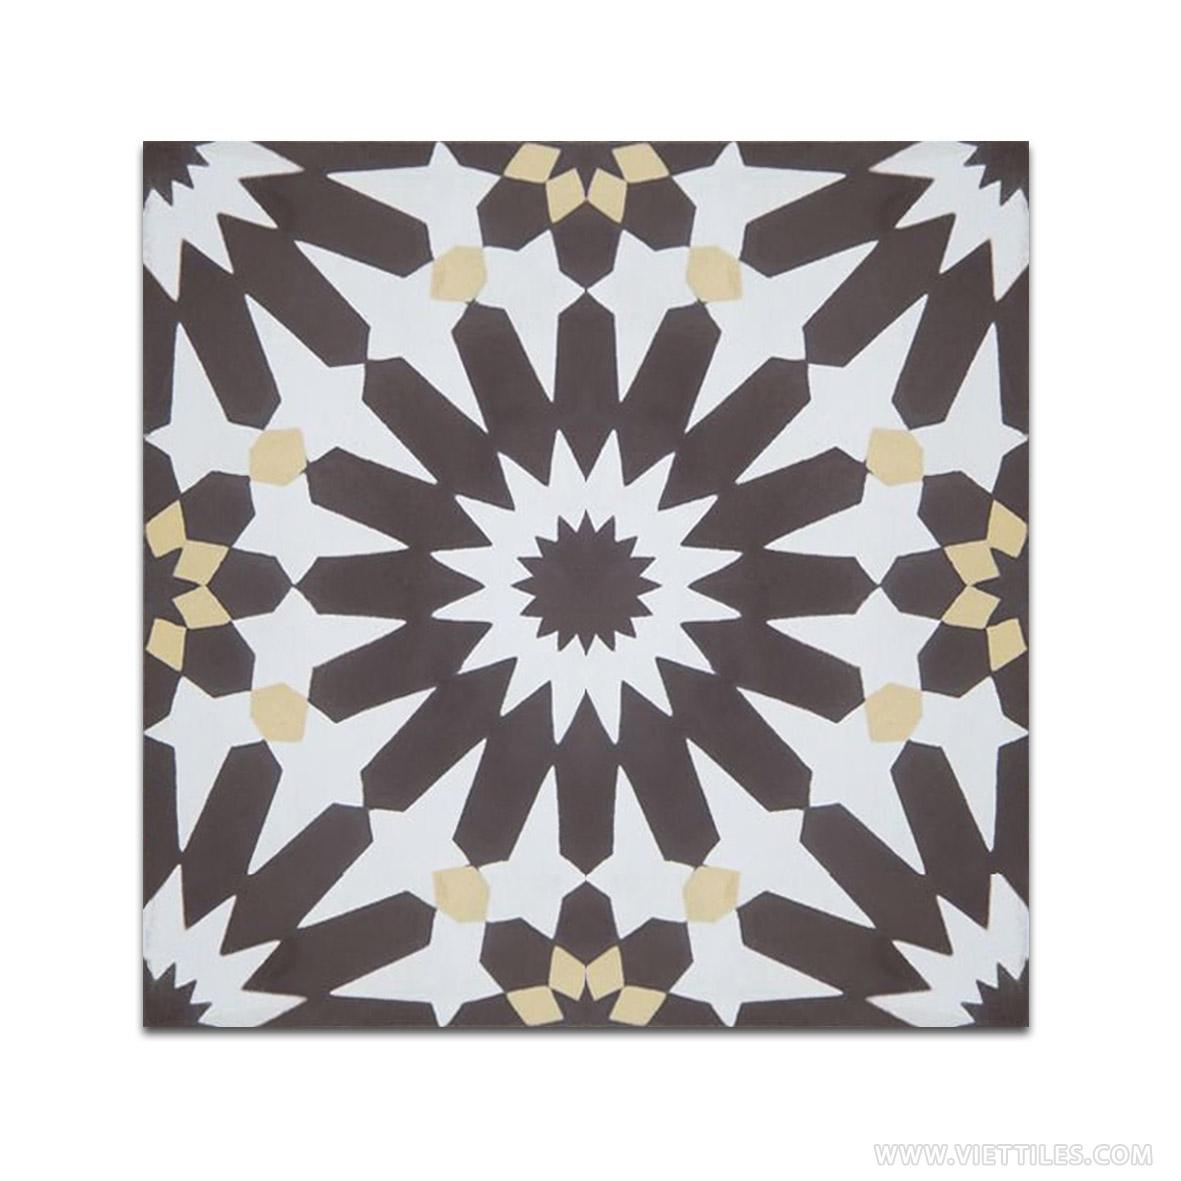 V20-395-T03 Cement Tile